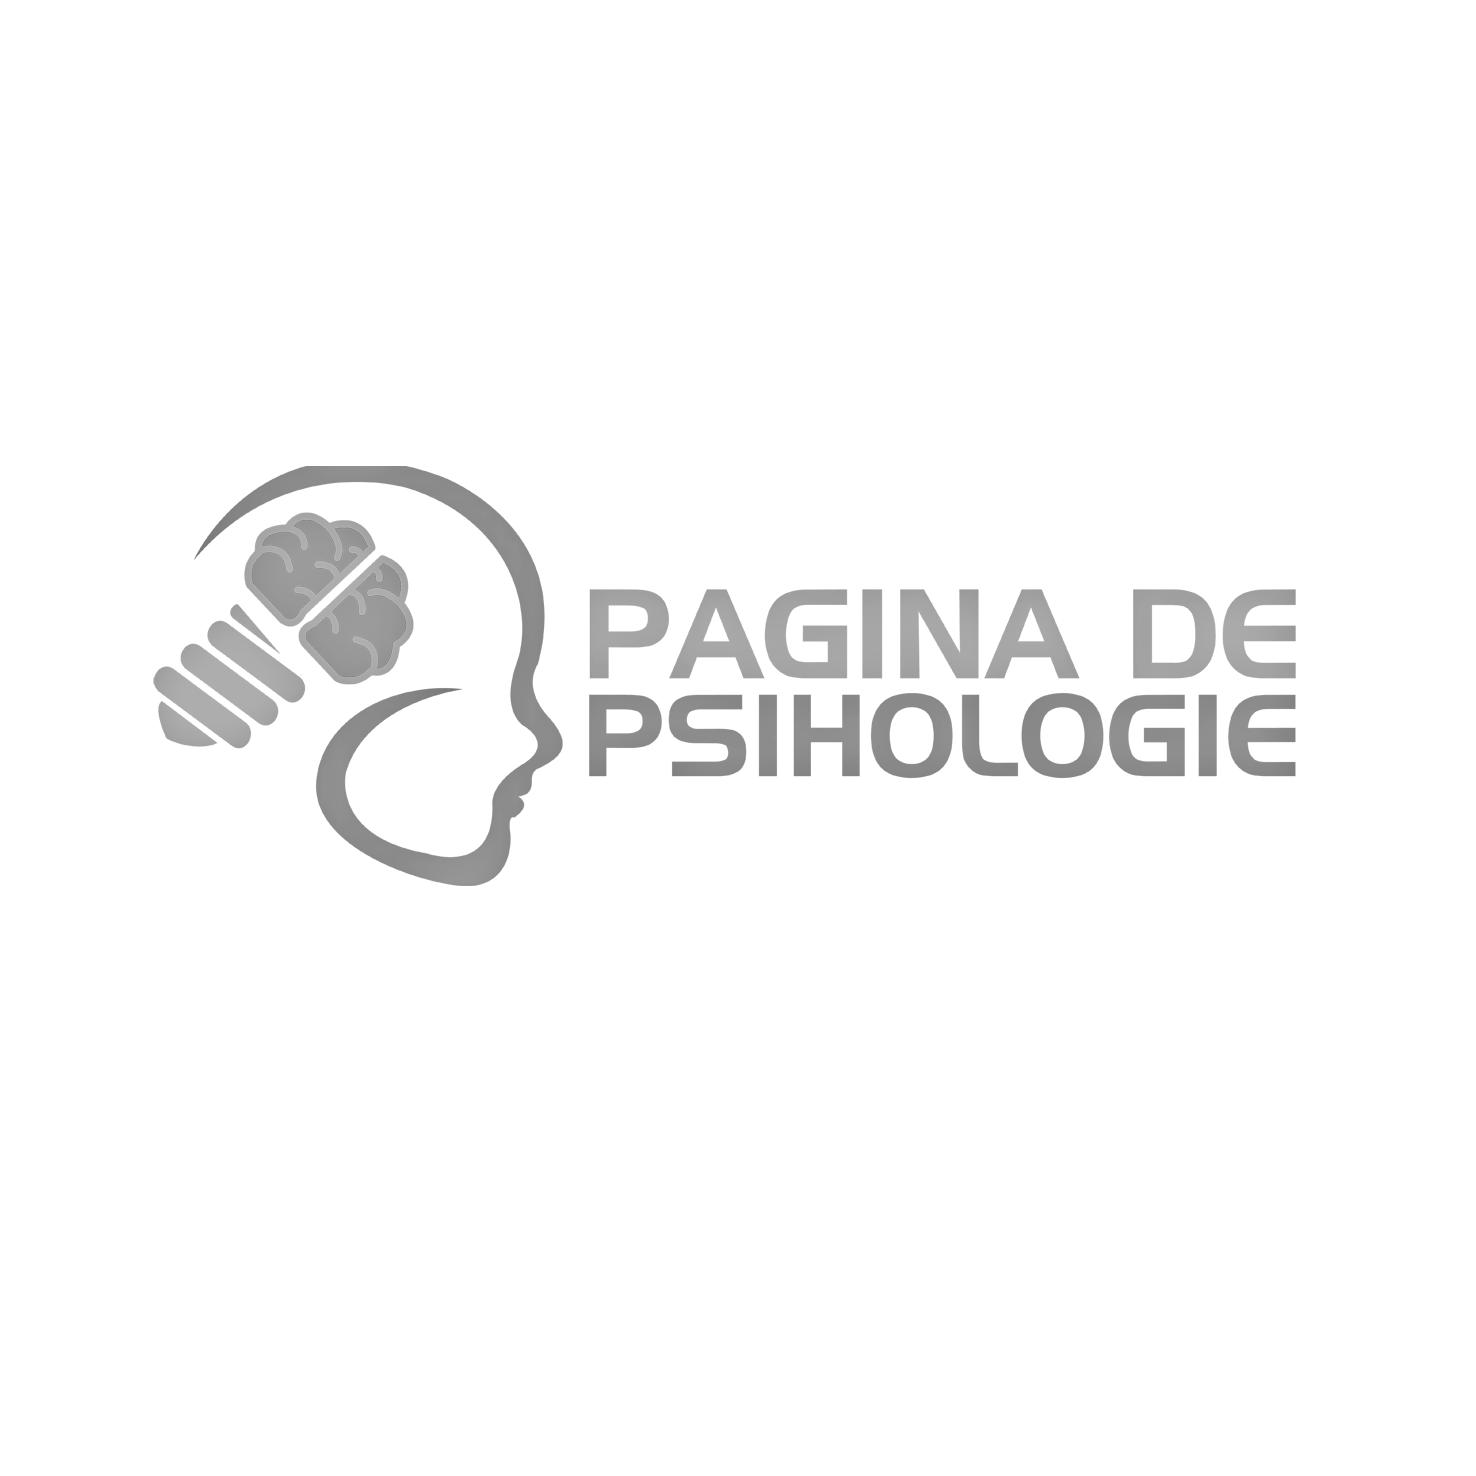 logo-pagina-de-psihologie_alb-negru_transparent